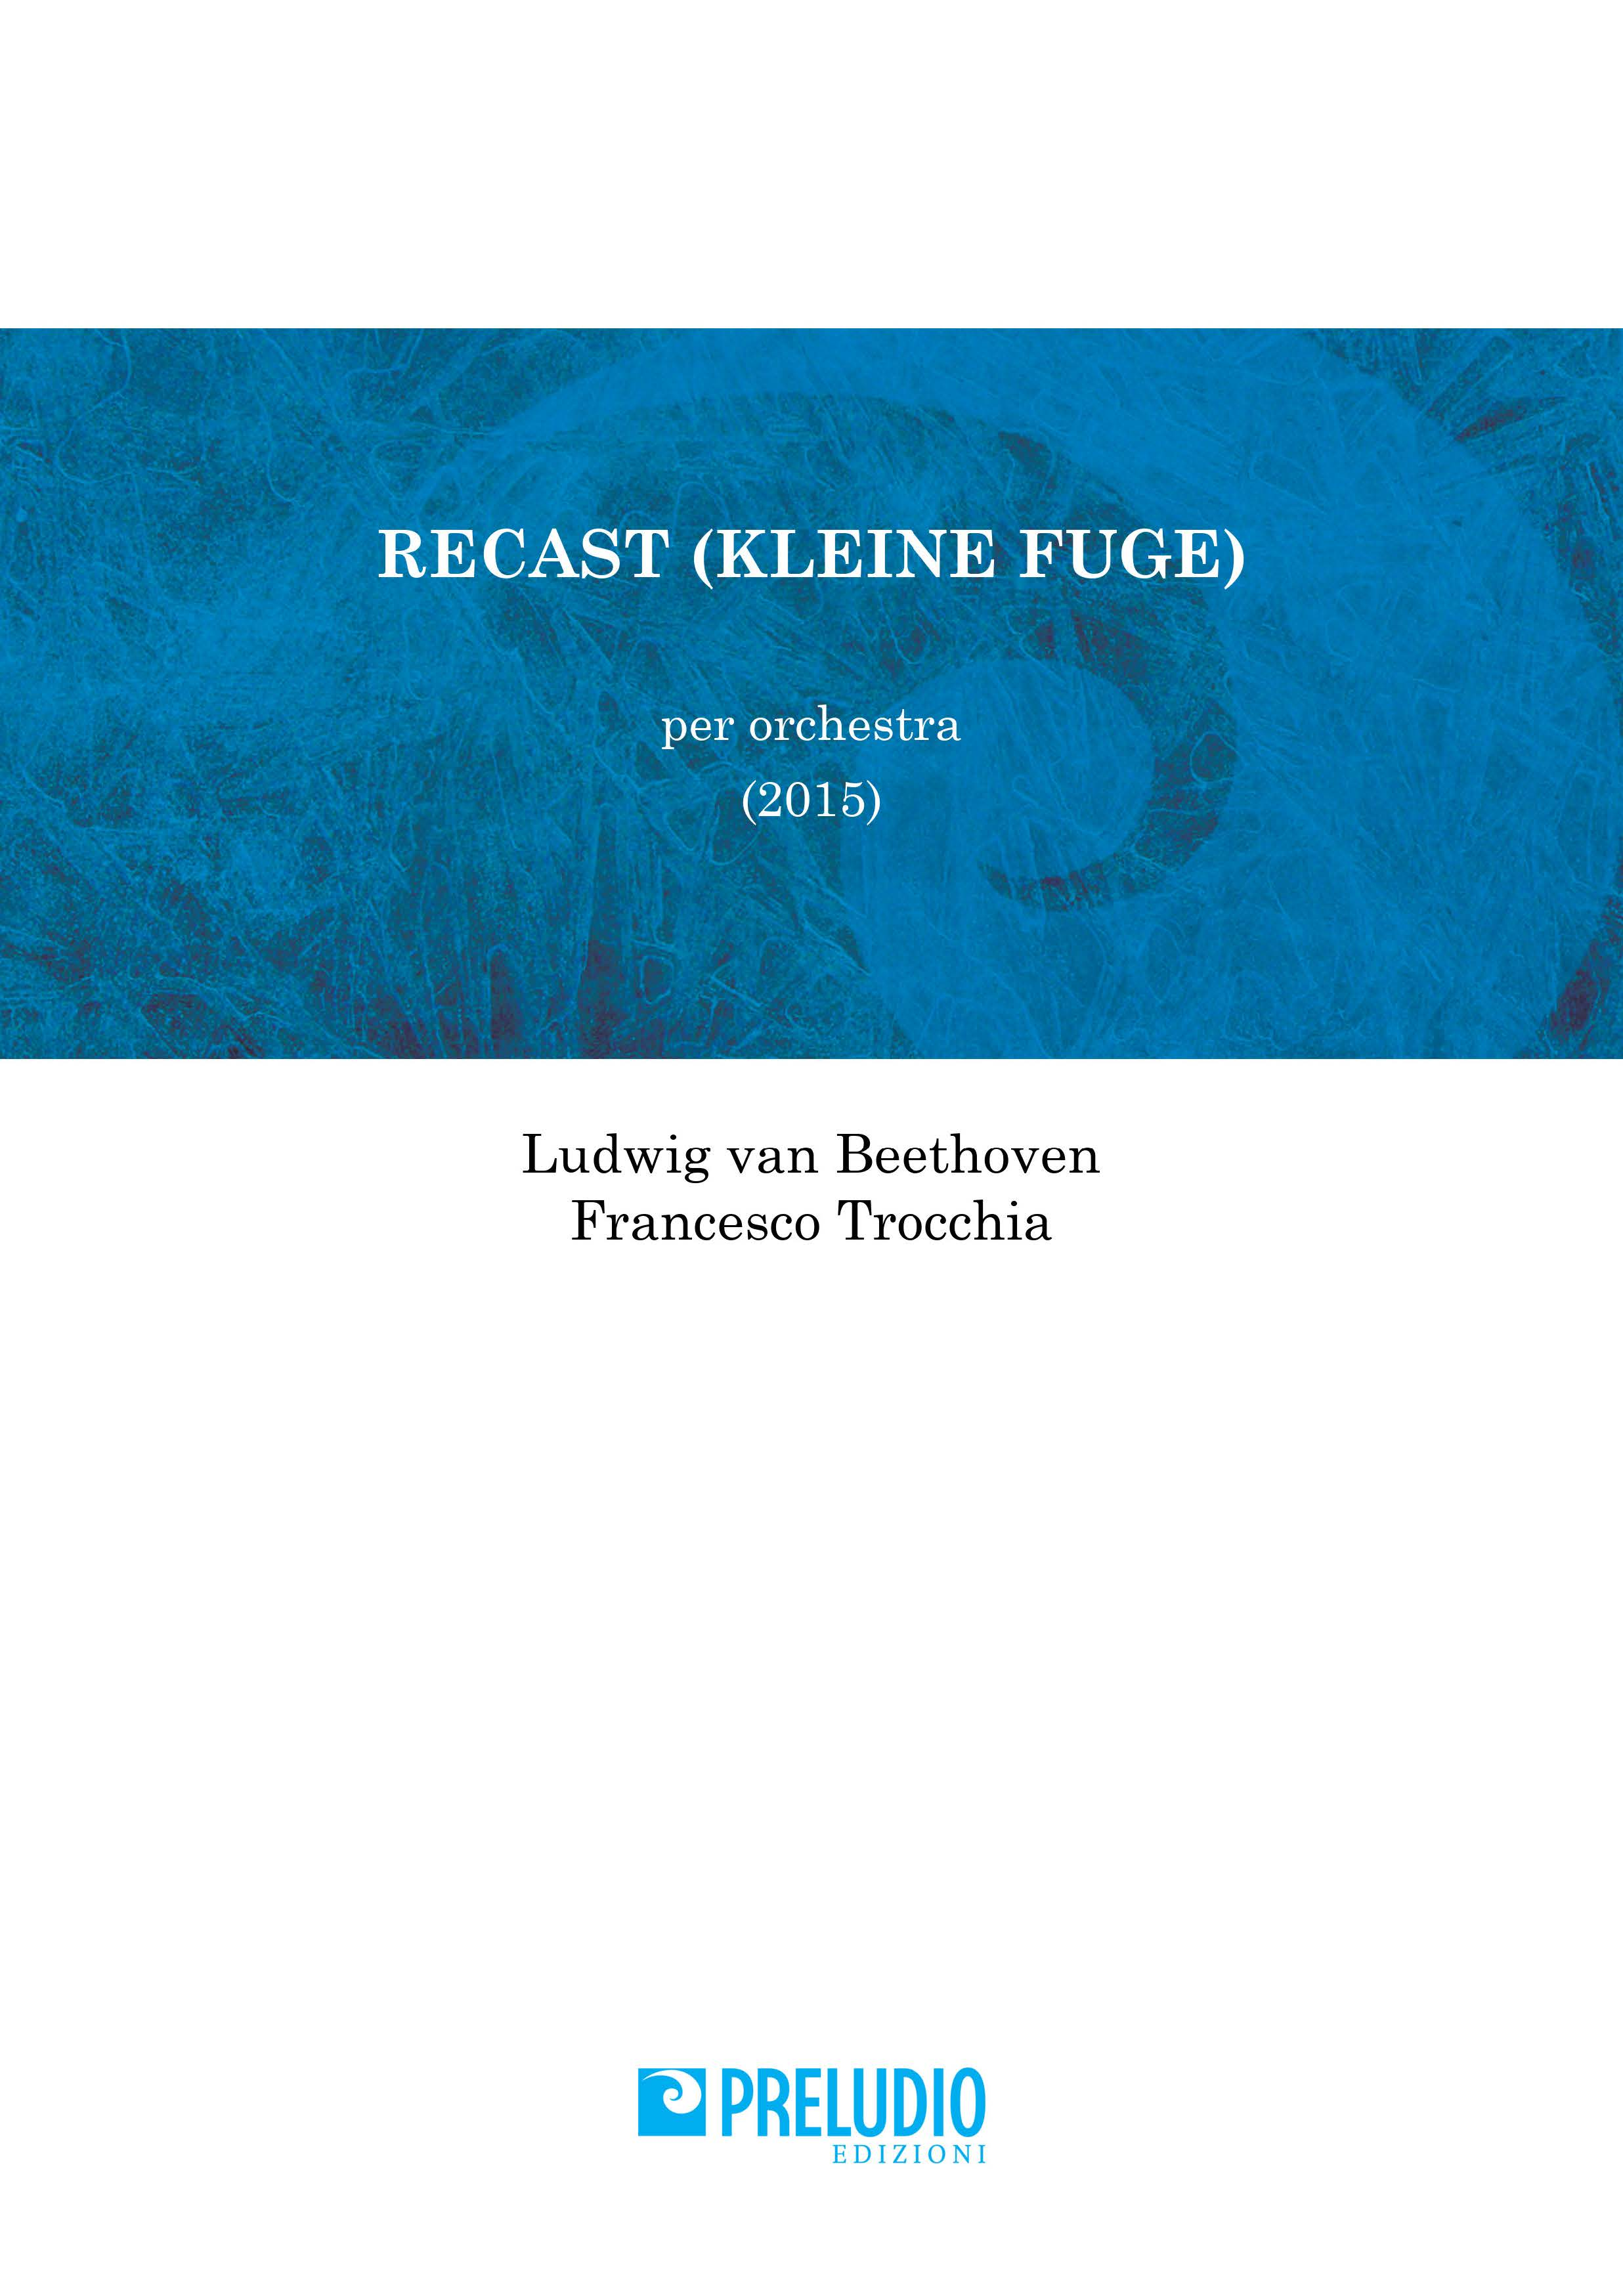 Recast (Kleine Fuge) per orchestra (2015)